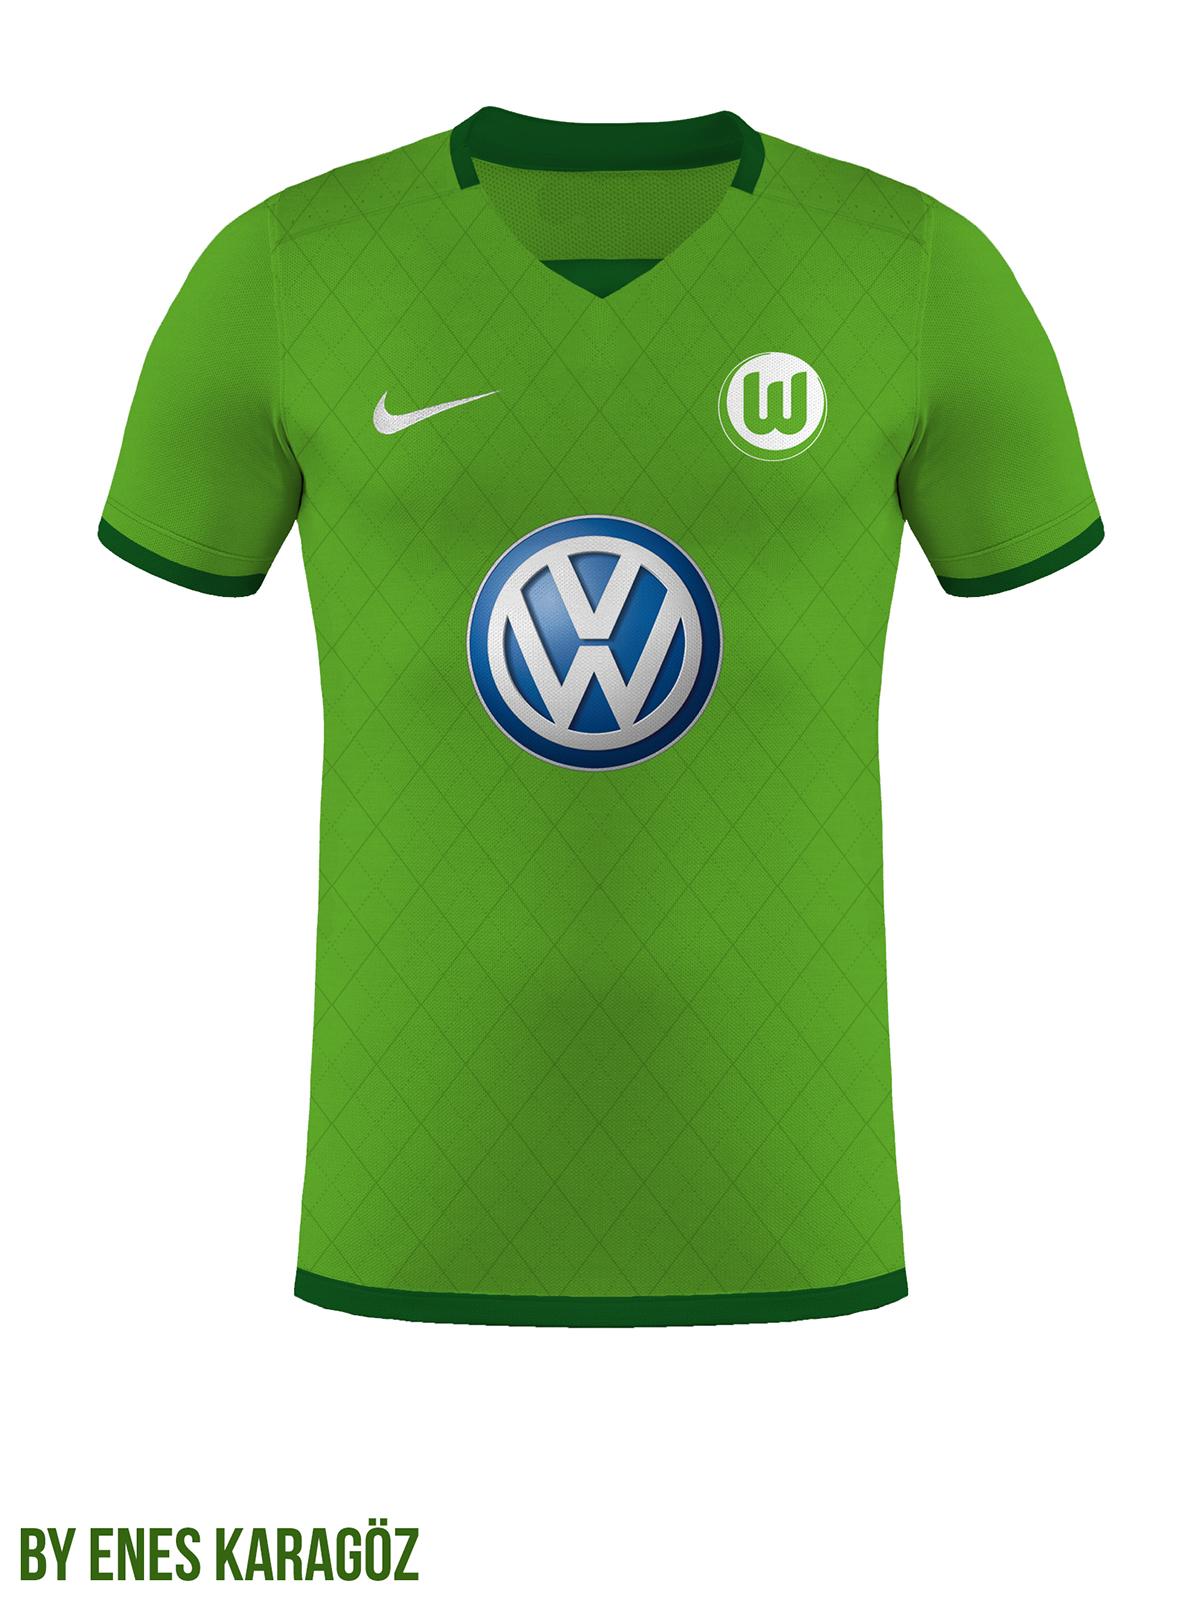 brand new b3a19 74508 VfL Wolfsburg Football Kits Home/Away on Behance